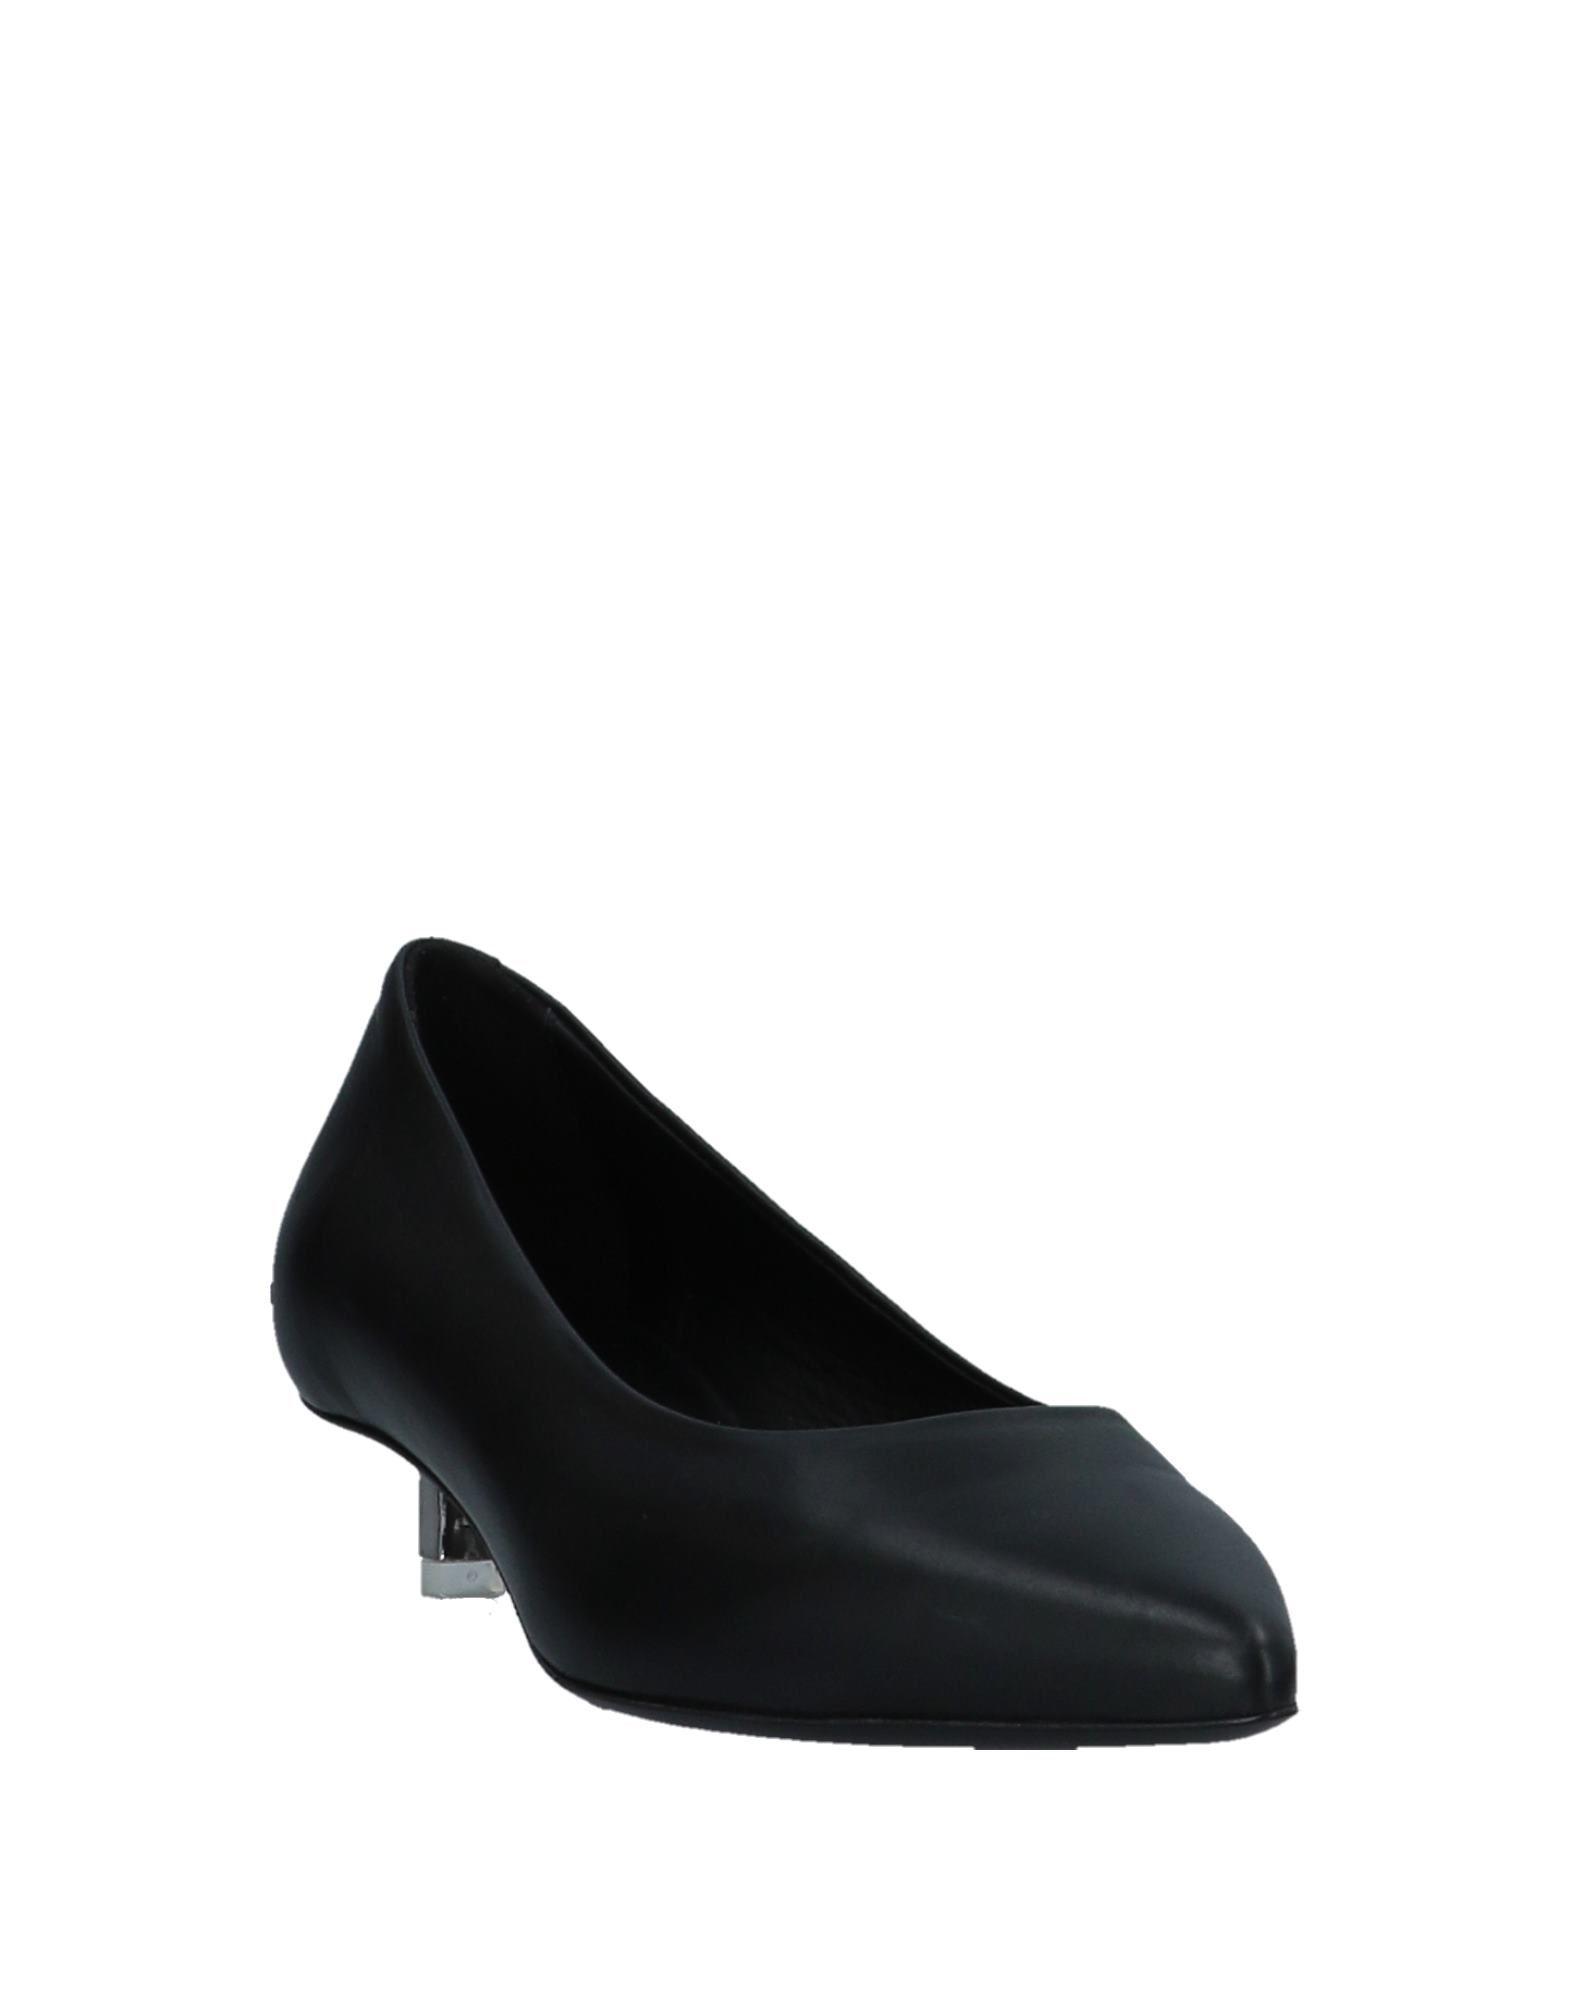 Stilvolle billige Schuhe Vic Vic Vic Matiē Pumps Damen  11538537WE 49c908